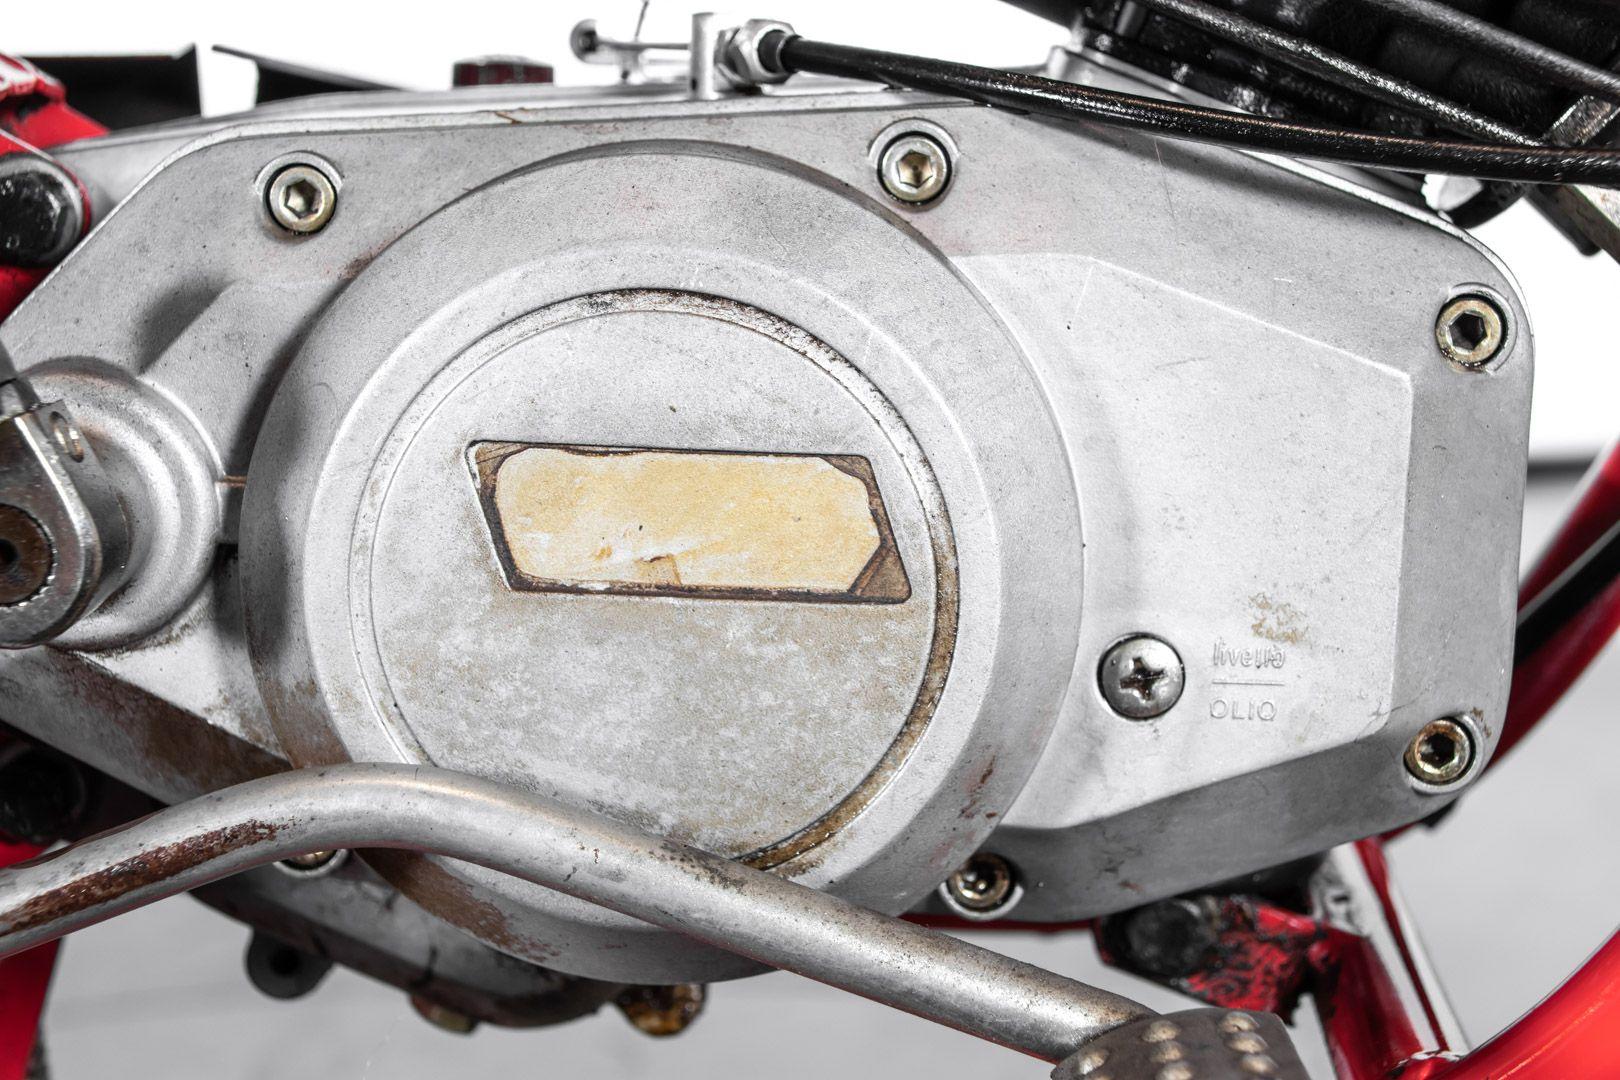 1978 Bonvicini Moto Jaguarino 50 82548